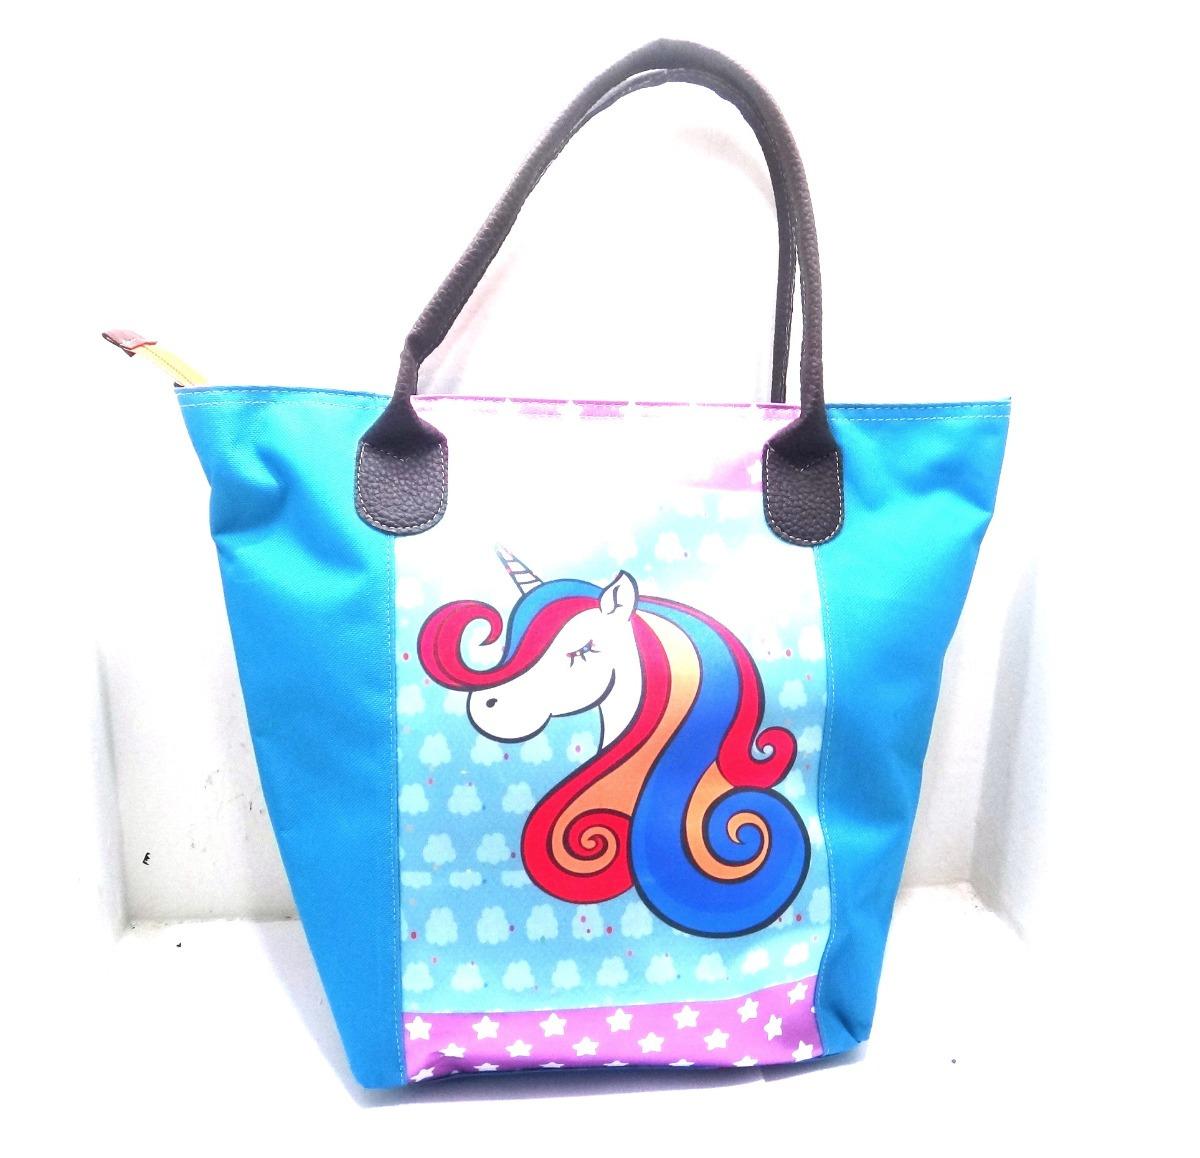 8a51922e8 cartera bolso bandolero mayor detal unicornio mujer moda mc. Cargando zoom.